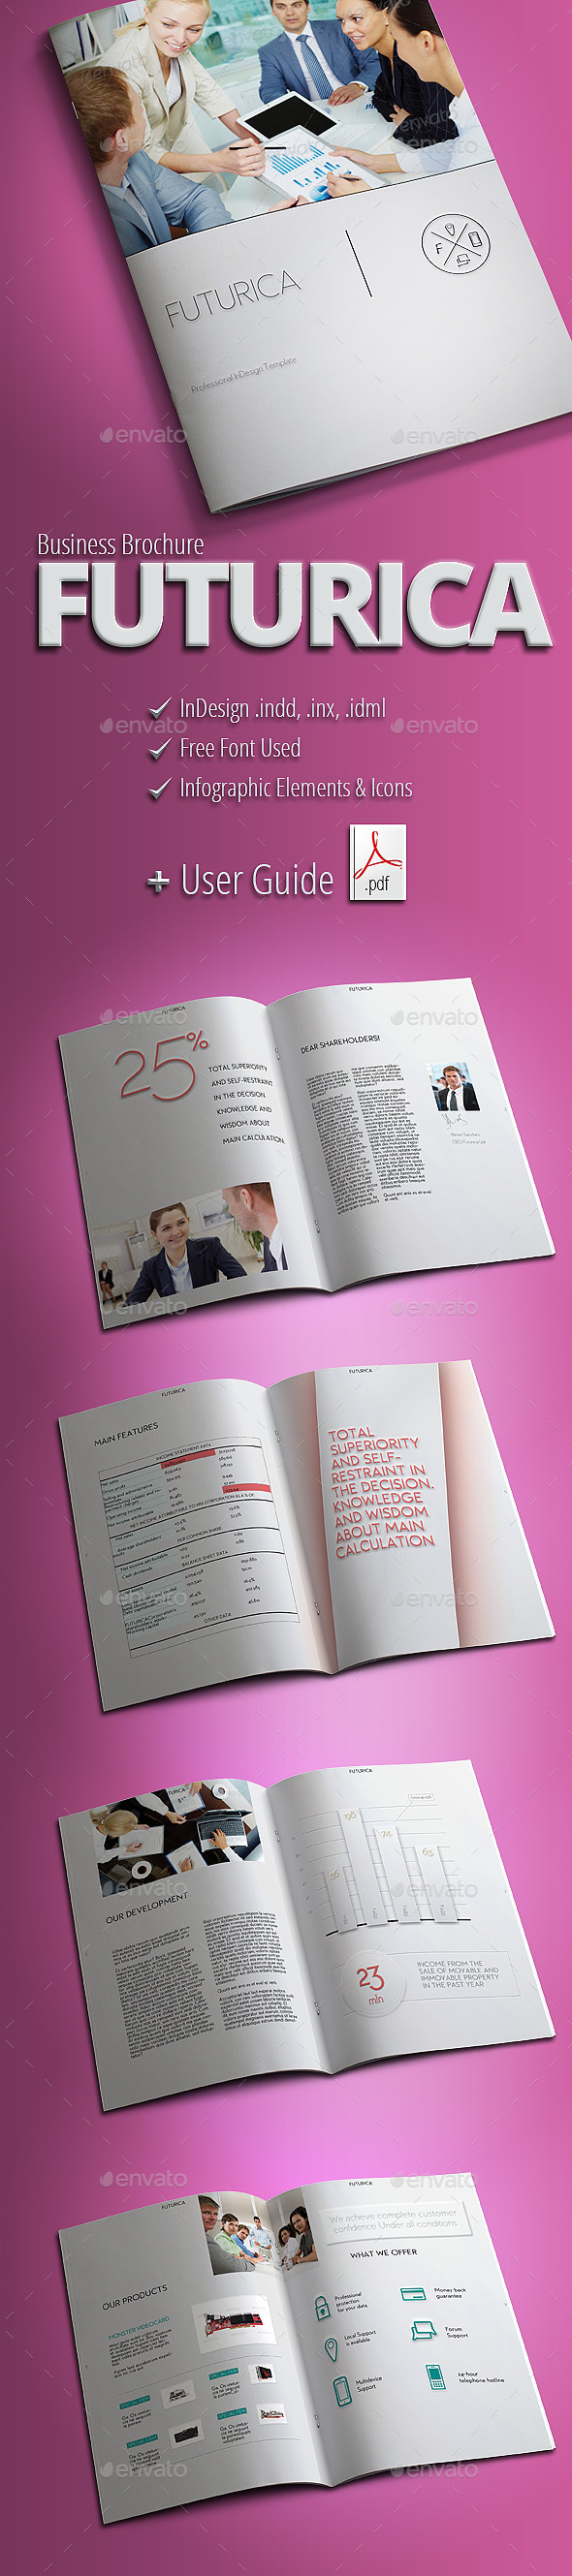 FUTURICA - Modern Business Brochure - Brochures Print Templates